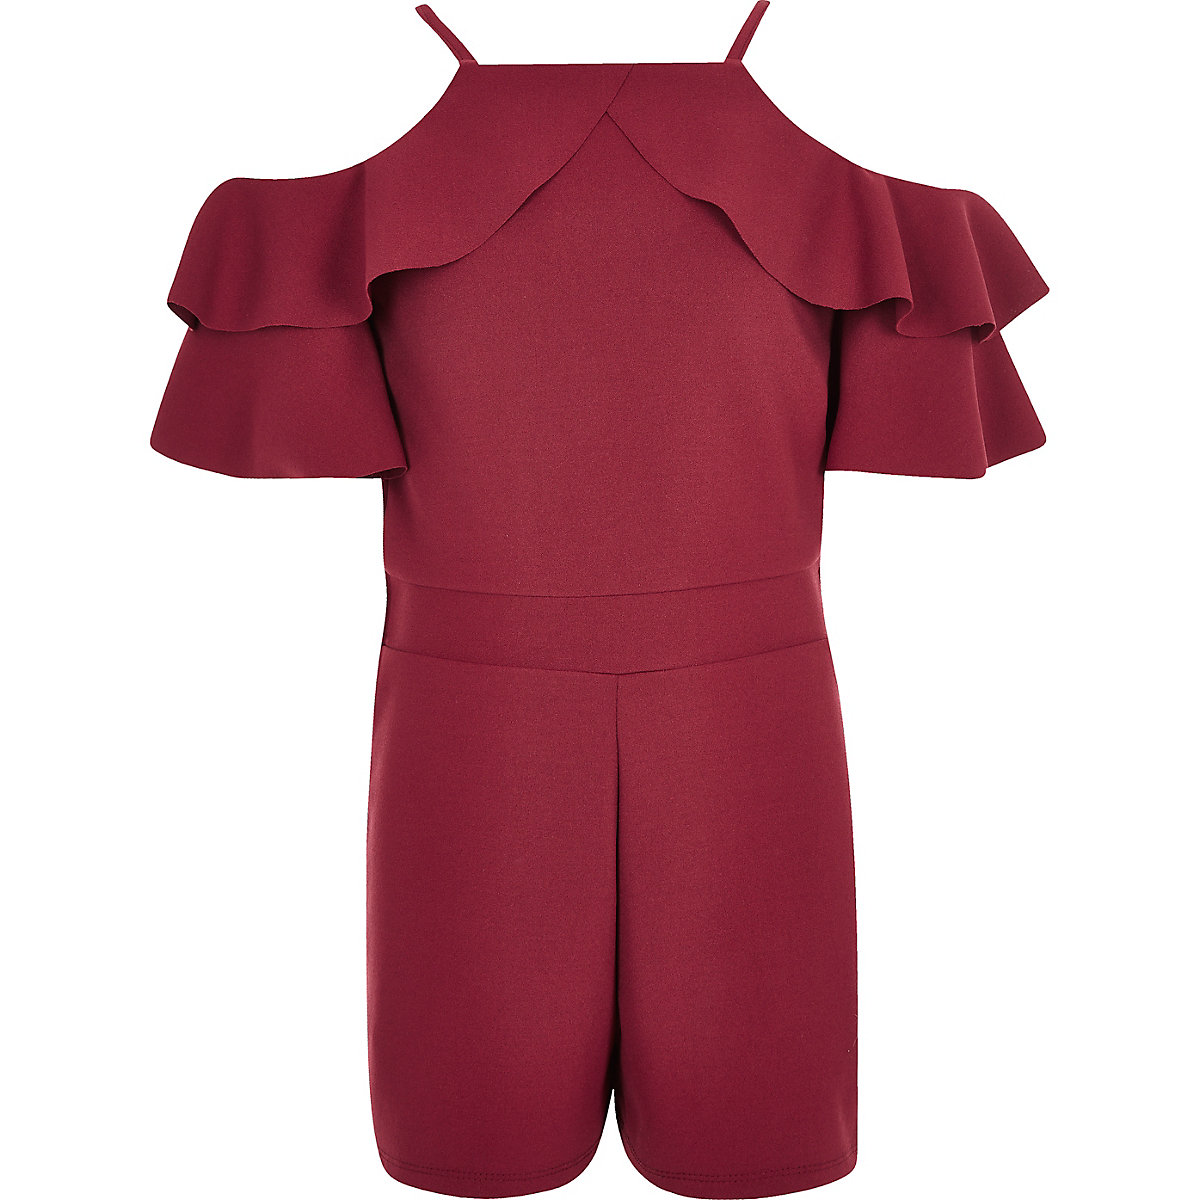 Girls burgundy ruffle cold shoulder playsuit